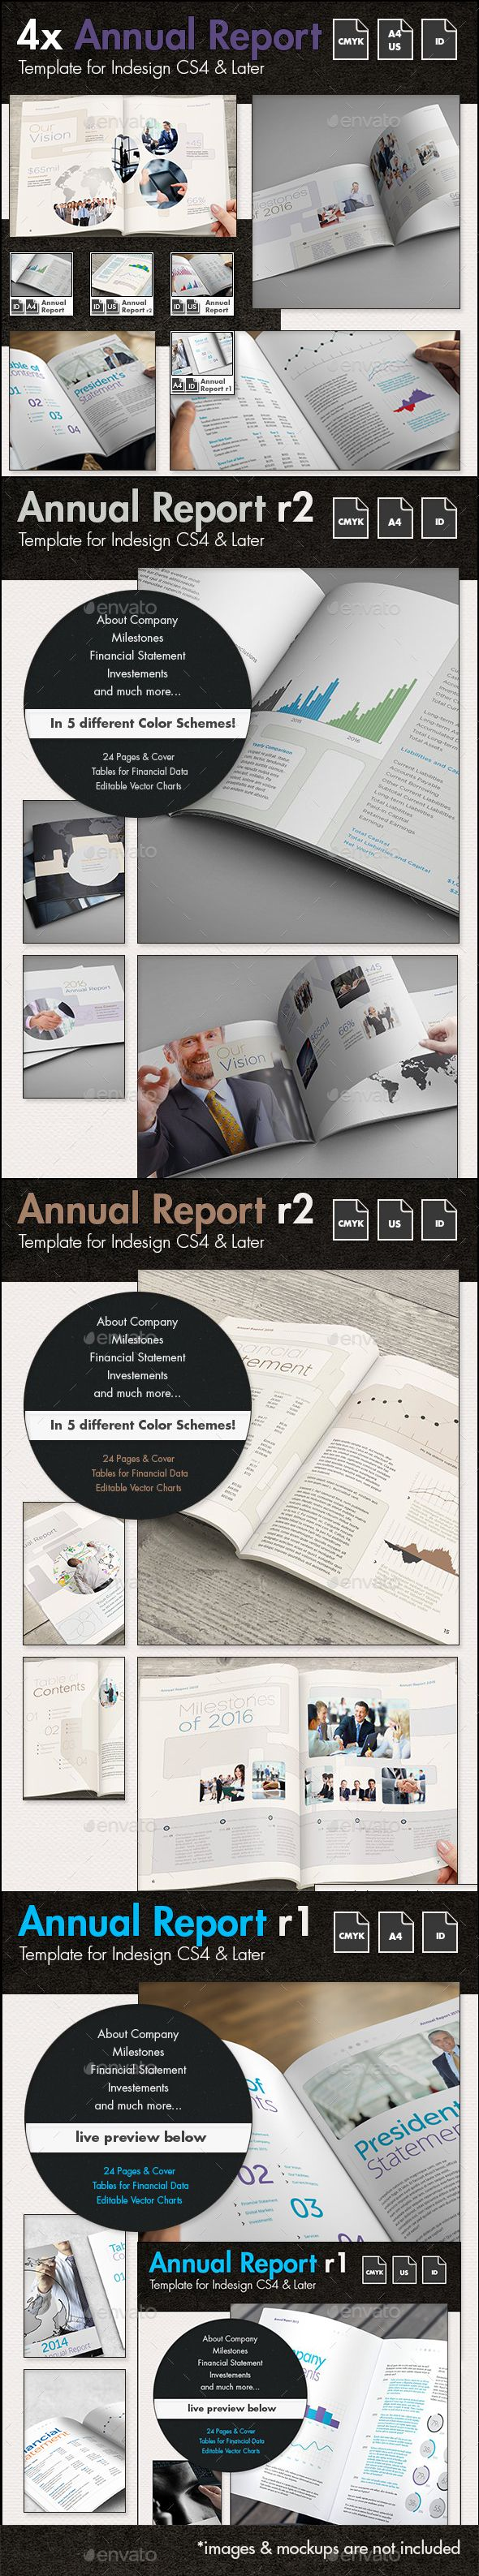 Annual Report Template Bundle